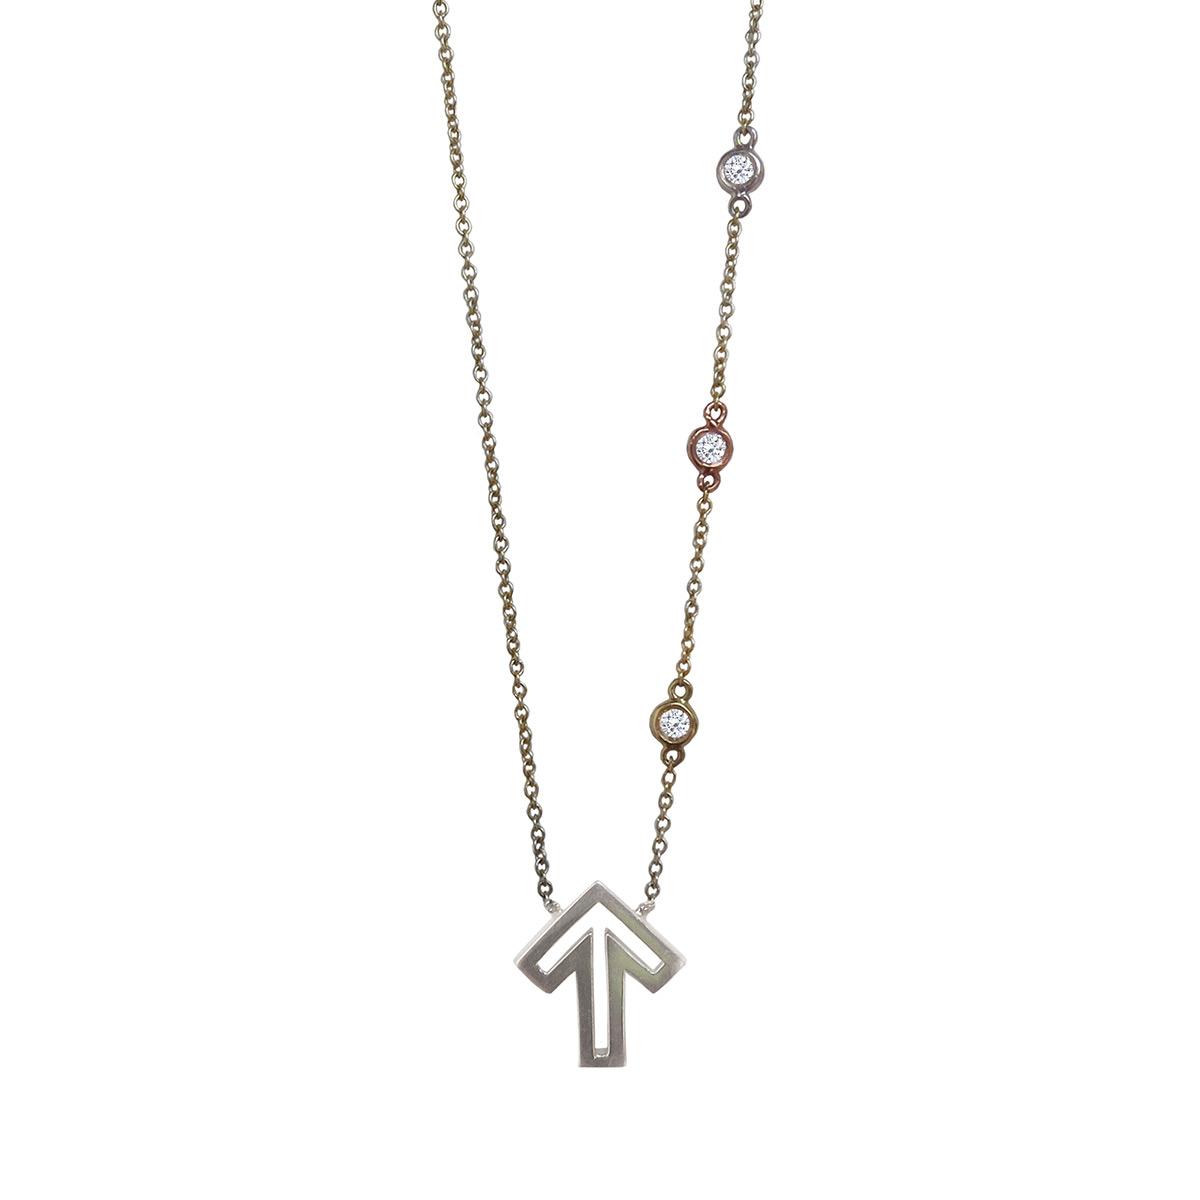 Golden Thread Journey 2 A Cure Open Arrow Necklace, Silver